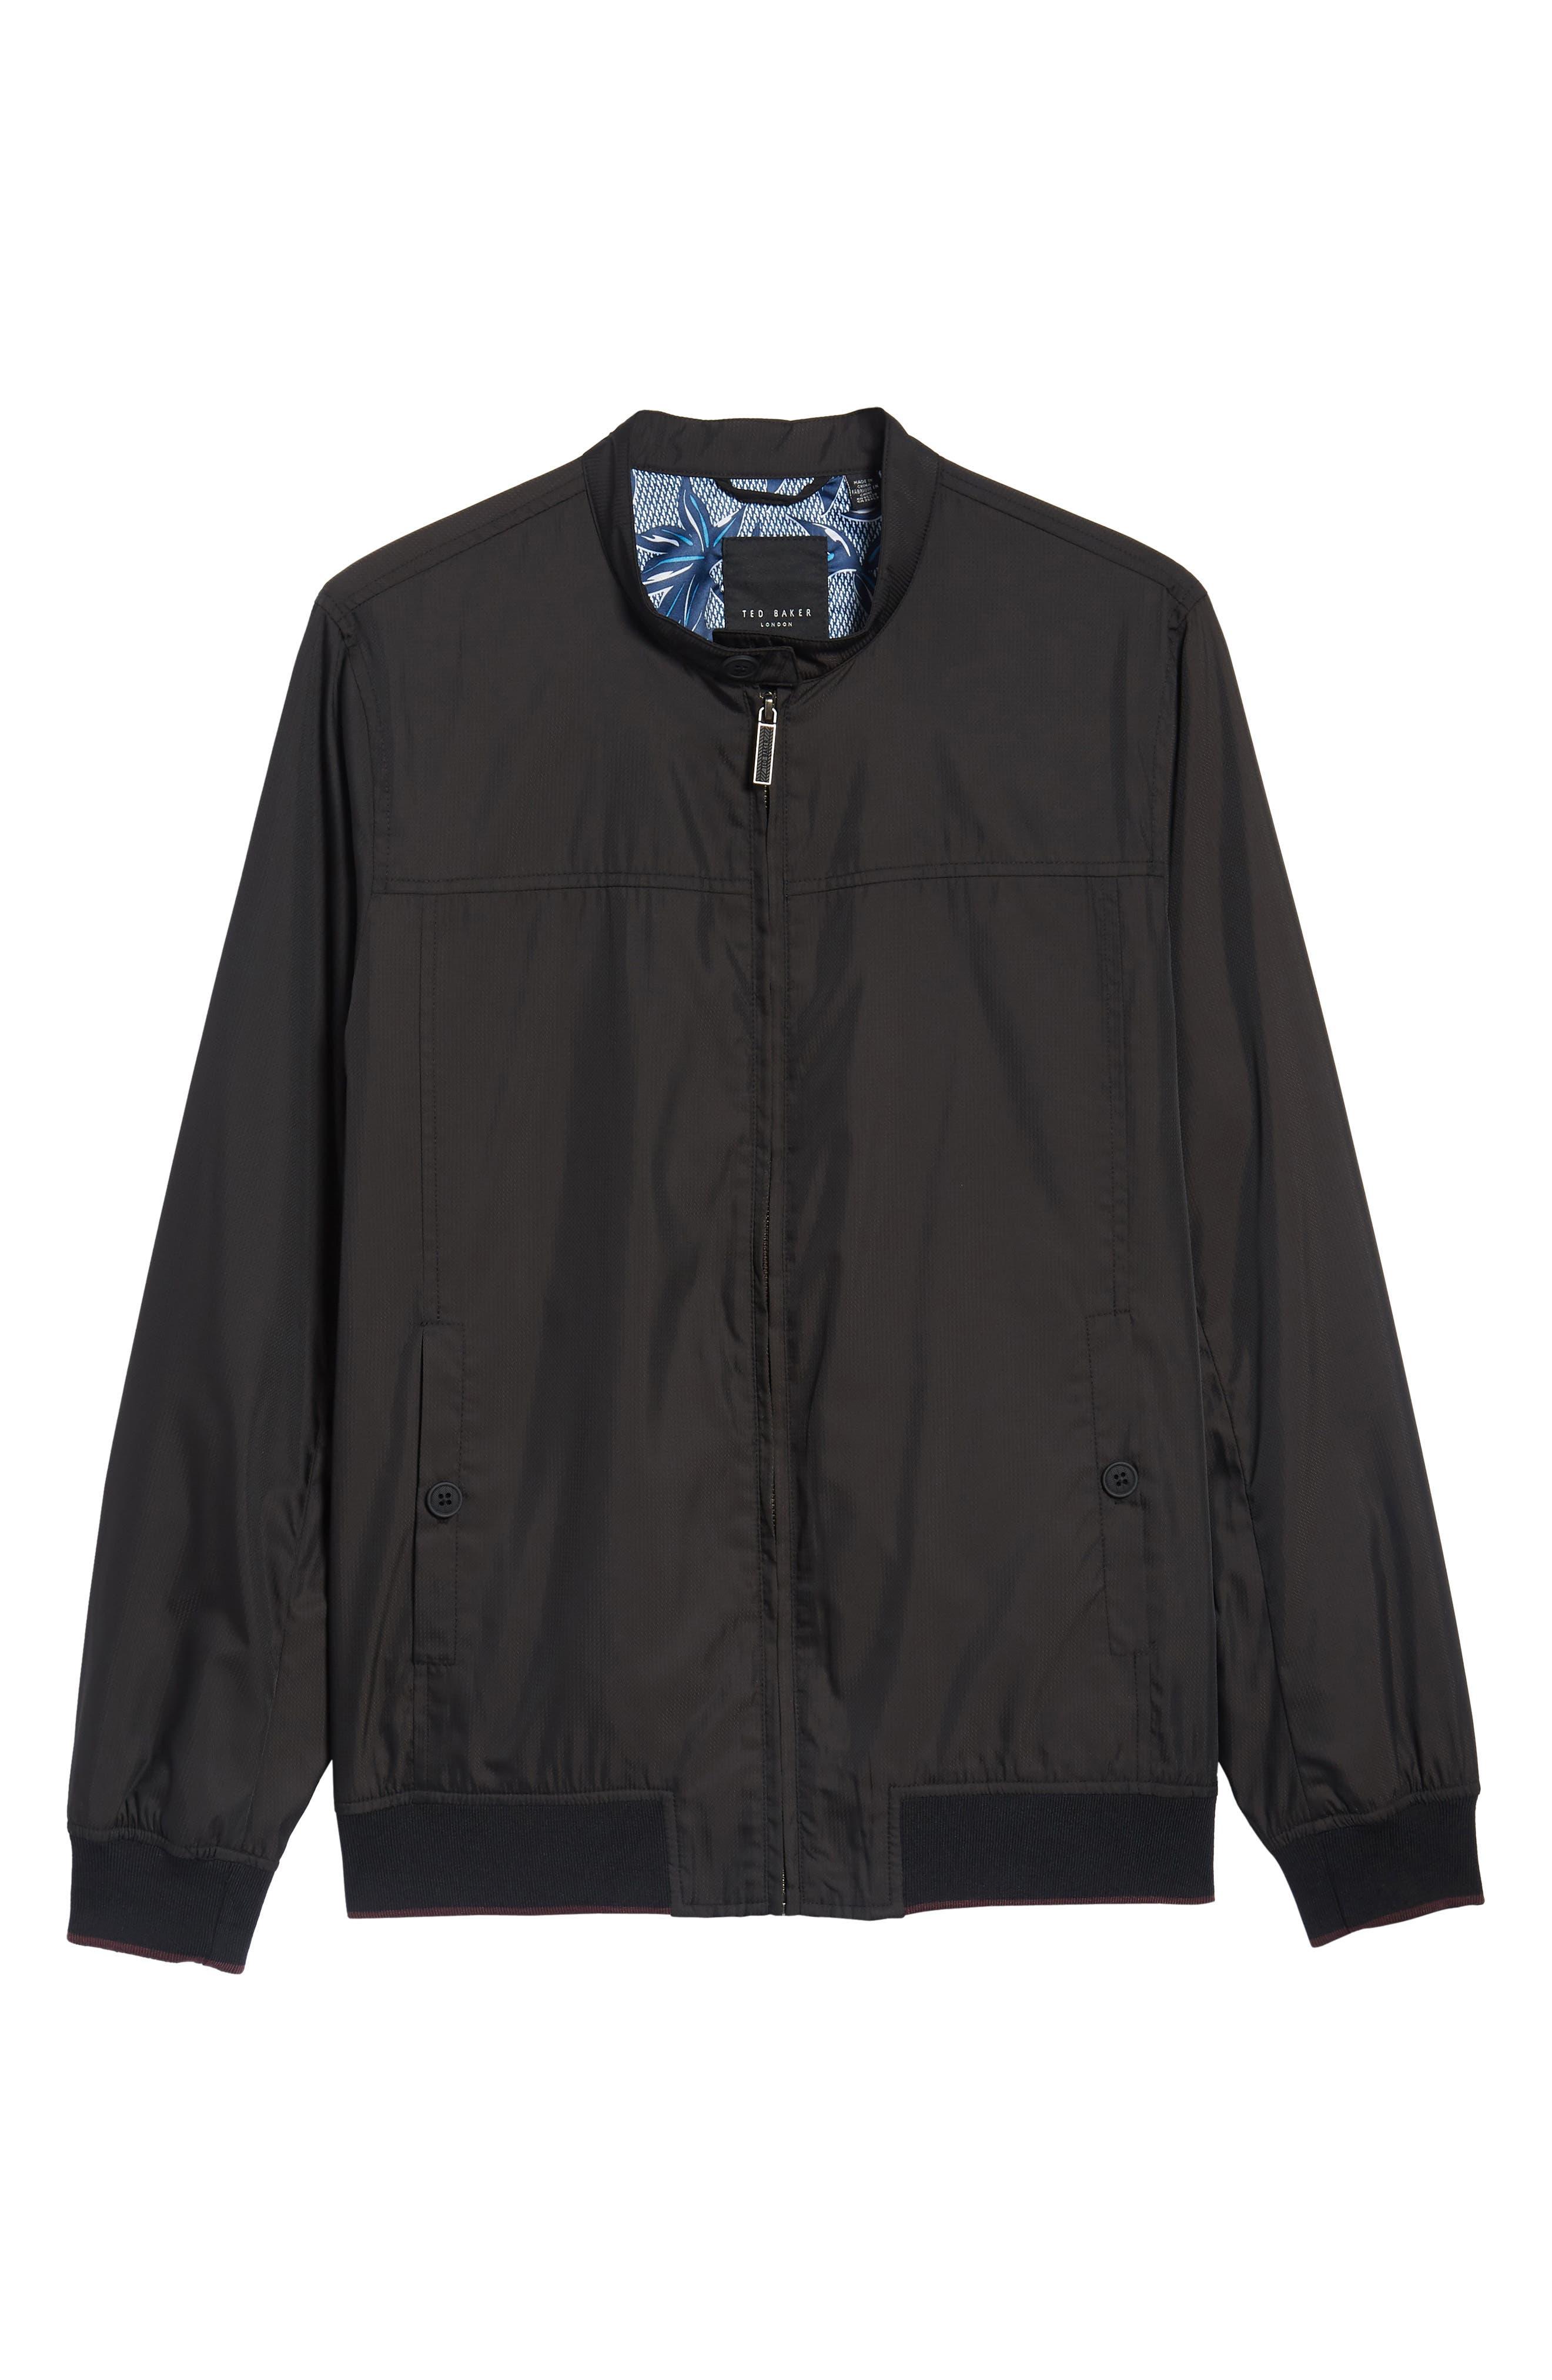 Calgar Nylon Bomber Jacket,                             Alternate thumbnail 6, color,                             Black